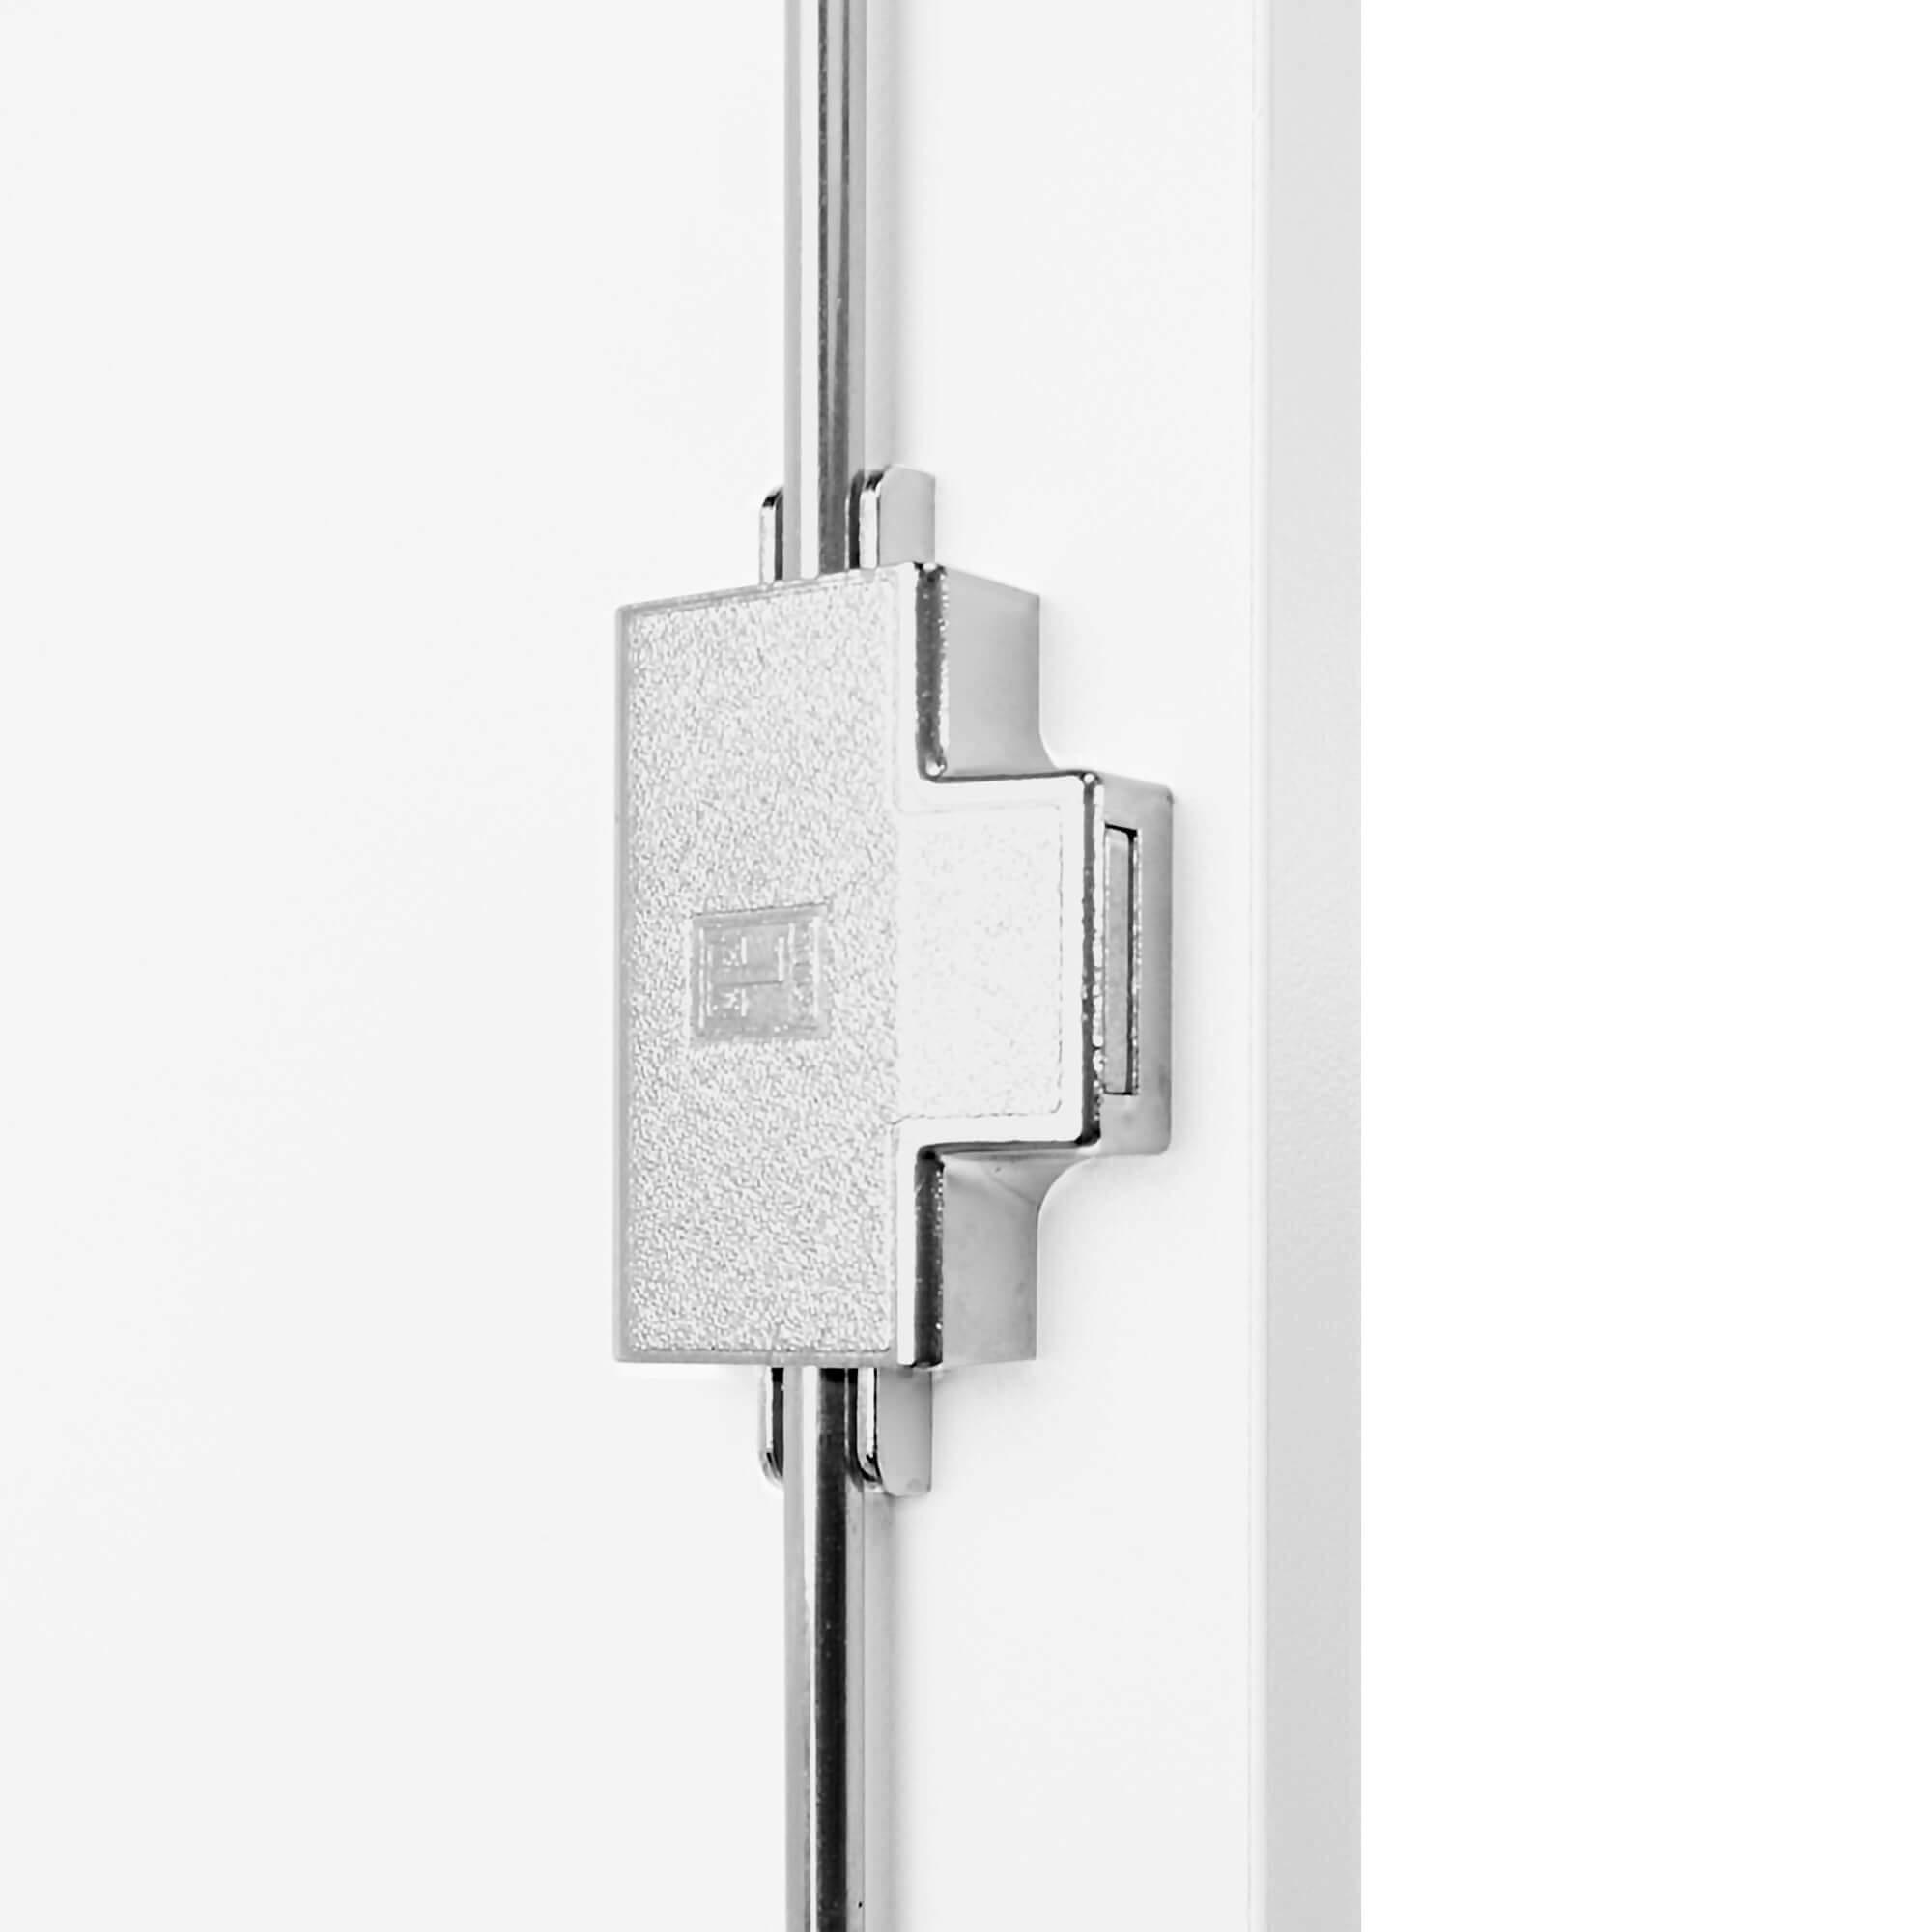 PROFI Aktenschrank abschließbar 5 OH Weiß Schrank Büroschrank Flügeltürenschrank